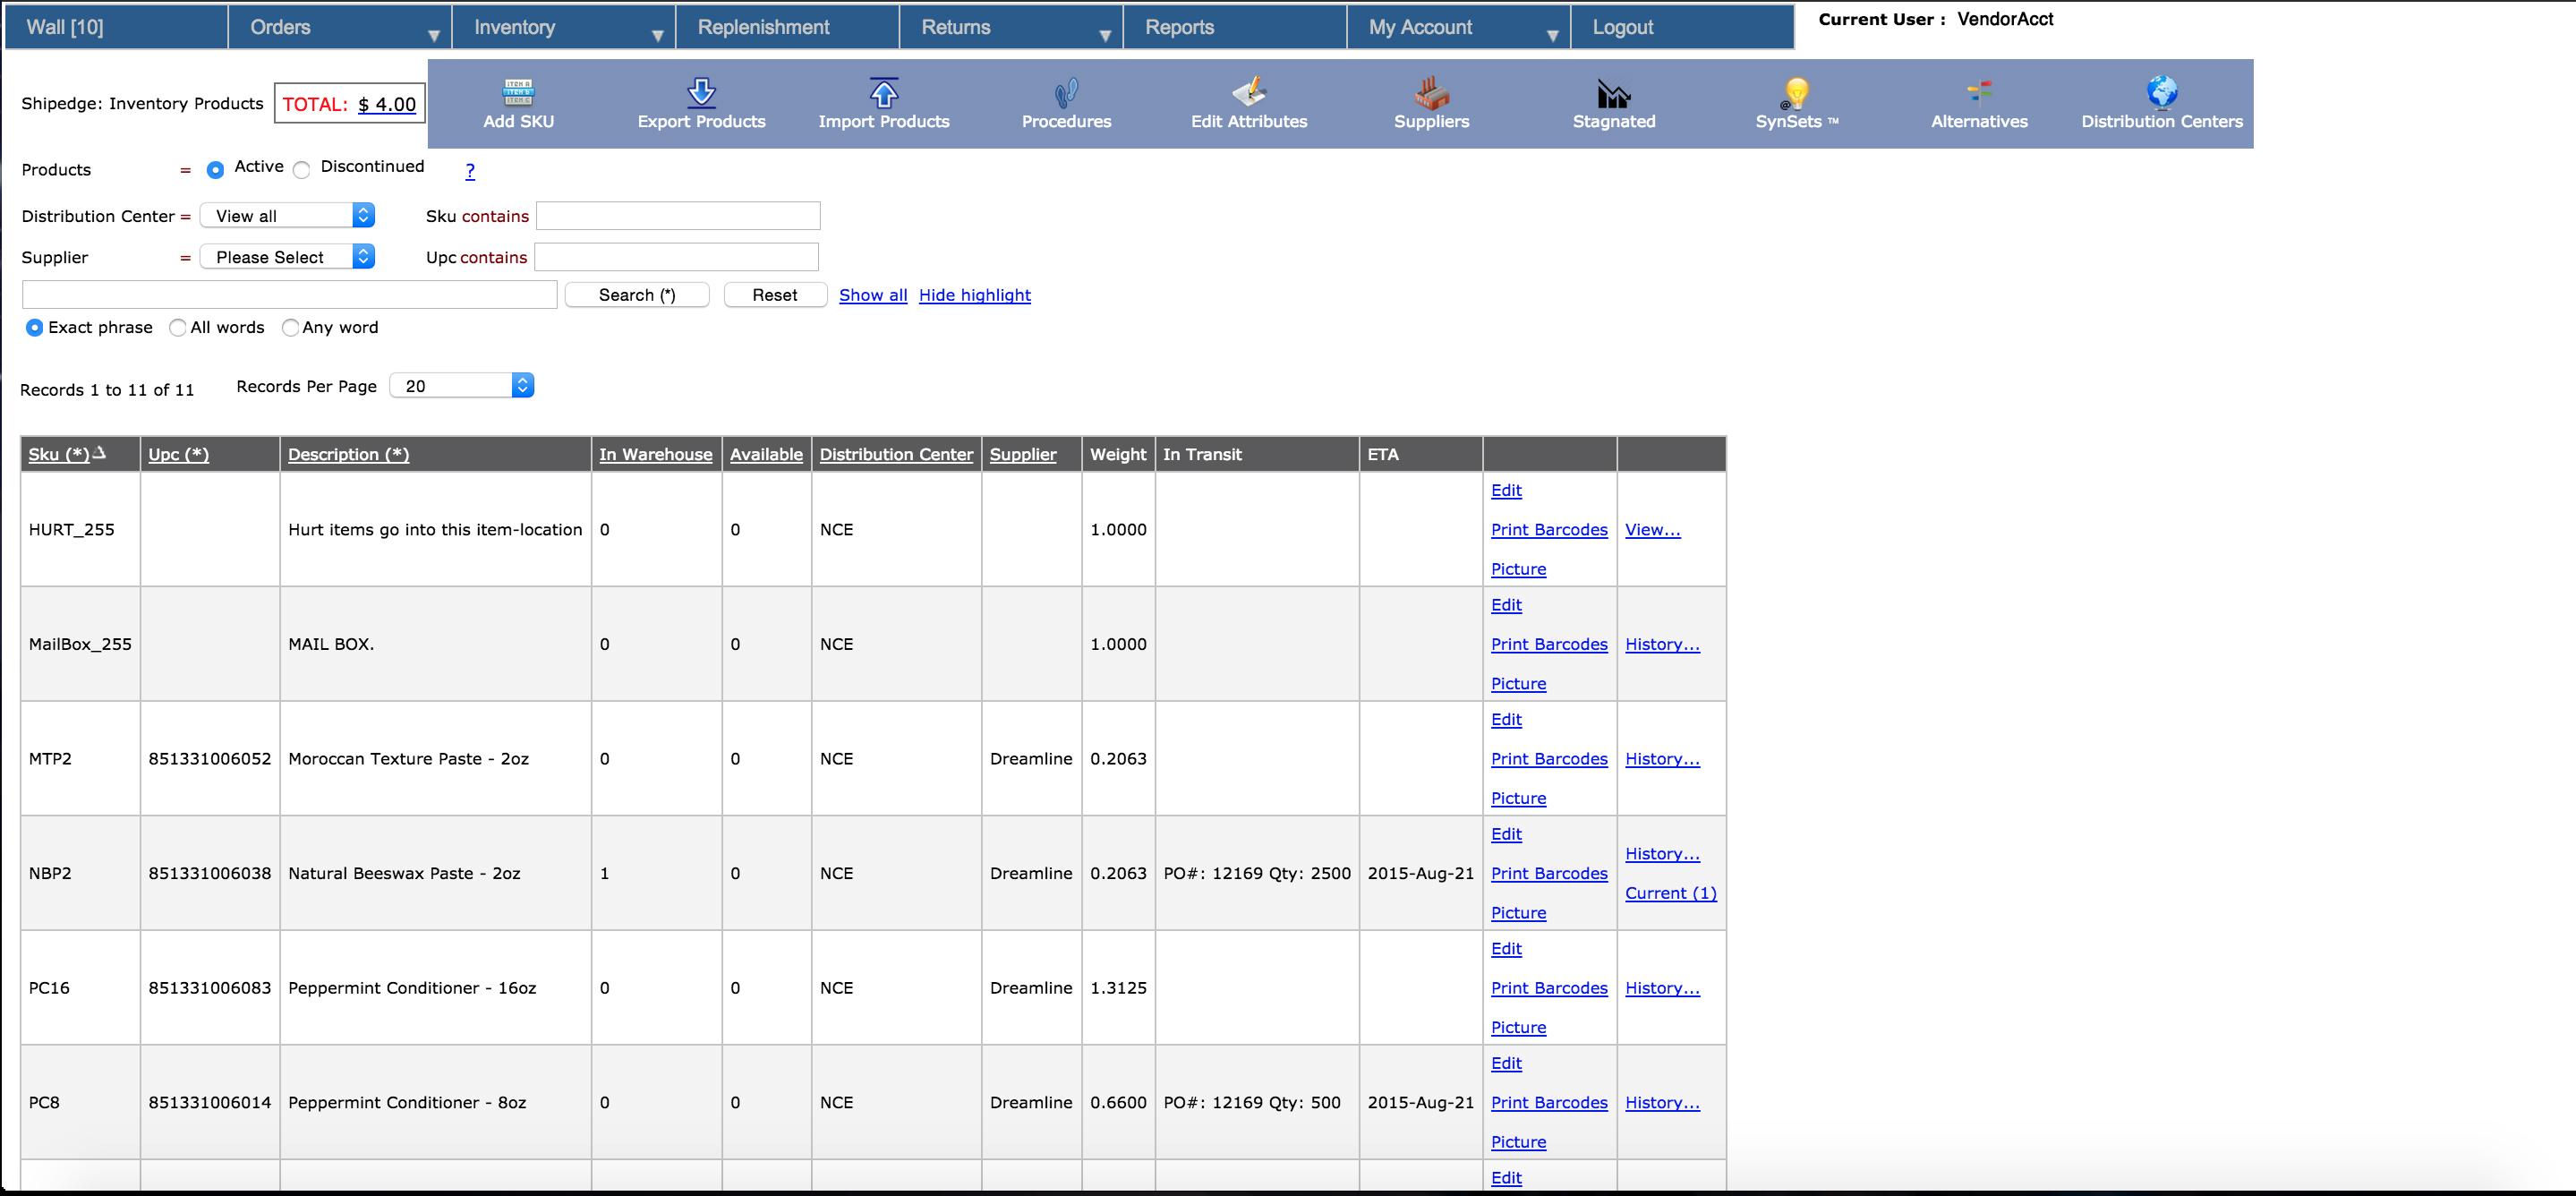 Shipedge Software - Inventory management